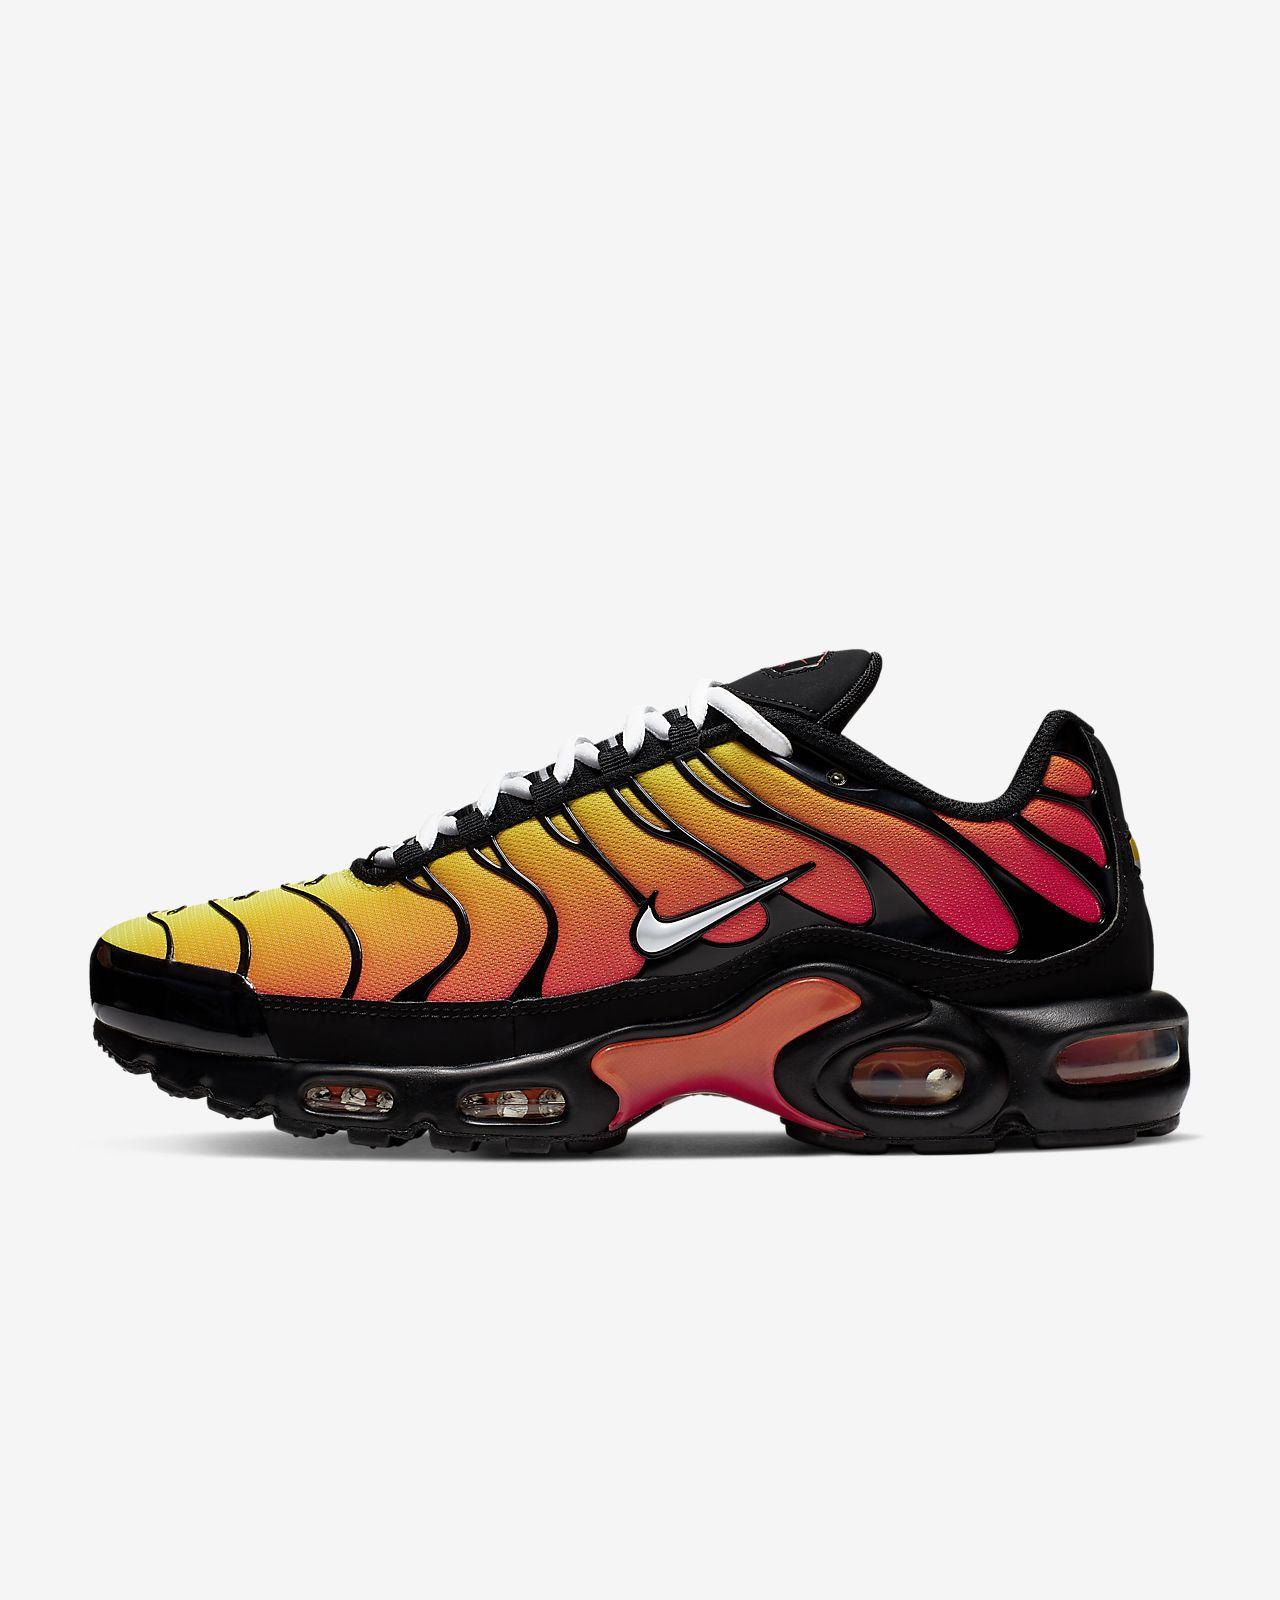 Comprar tenis Nike Air Max para hombre. ES